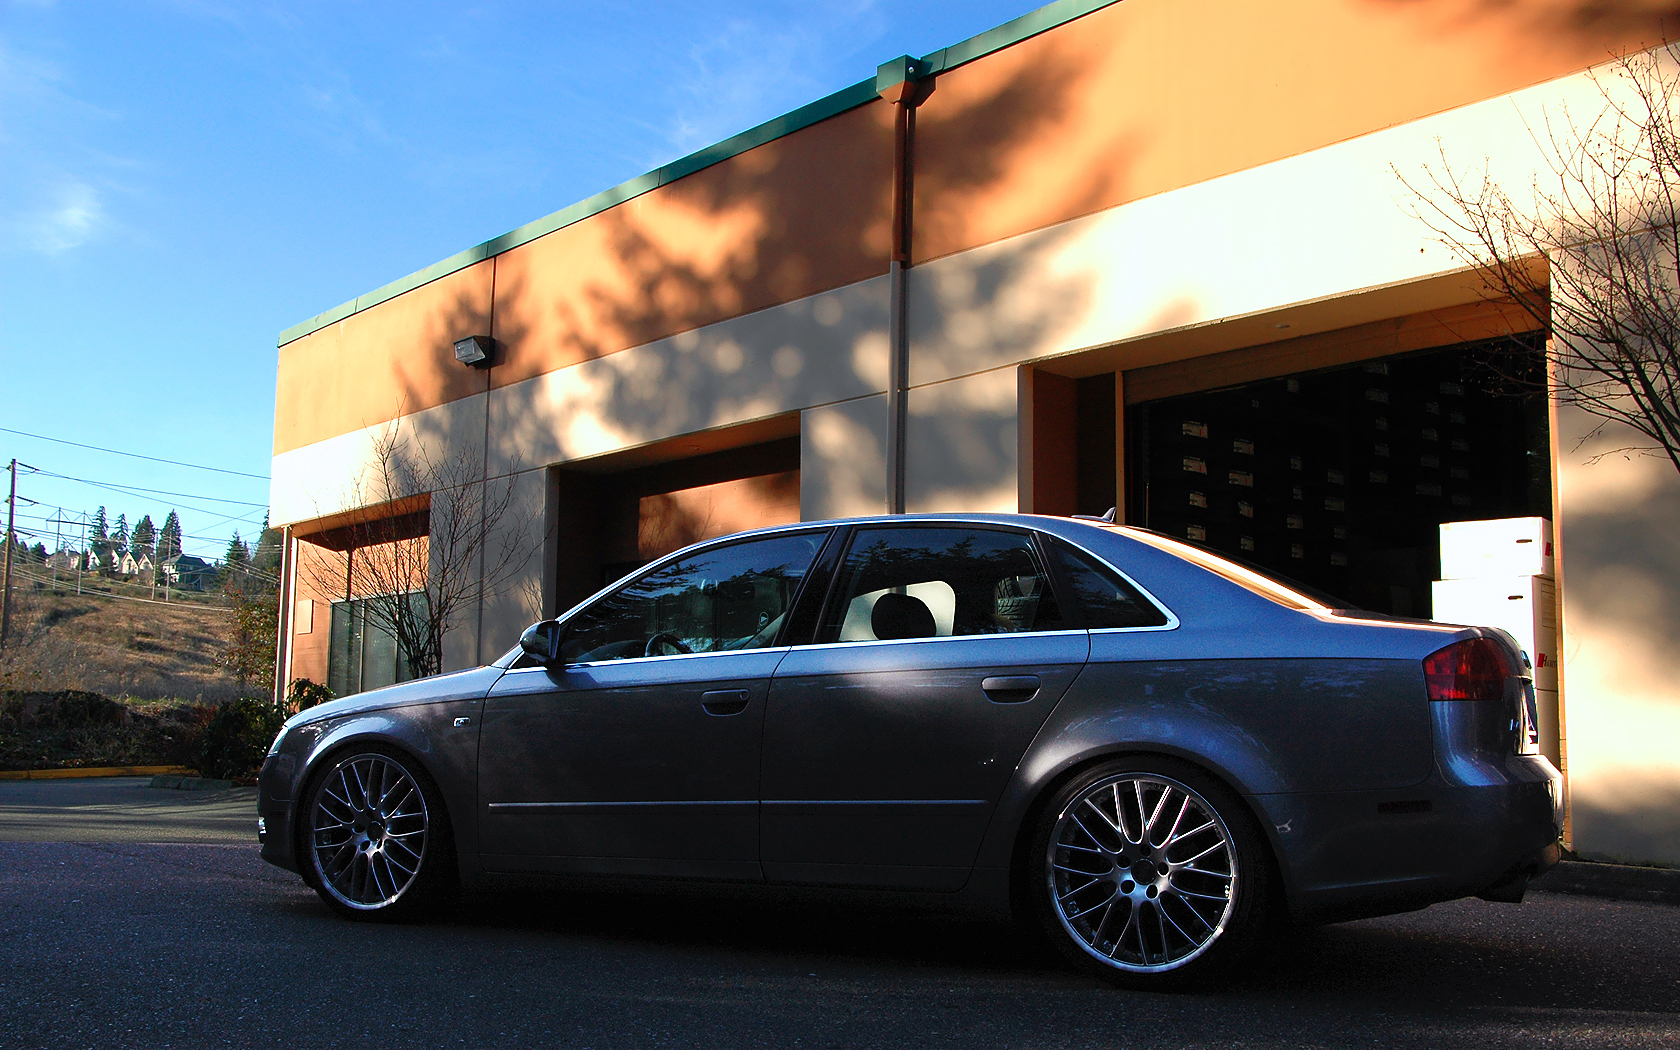 Audi b7 a4 hartmann euromesh 3 19 cl 1